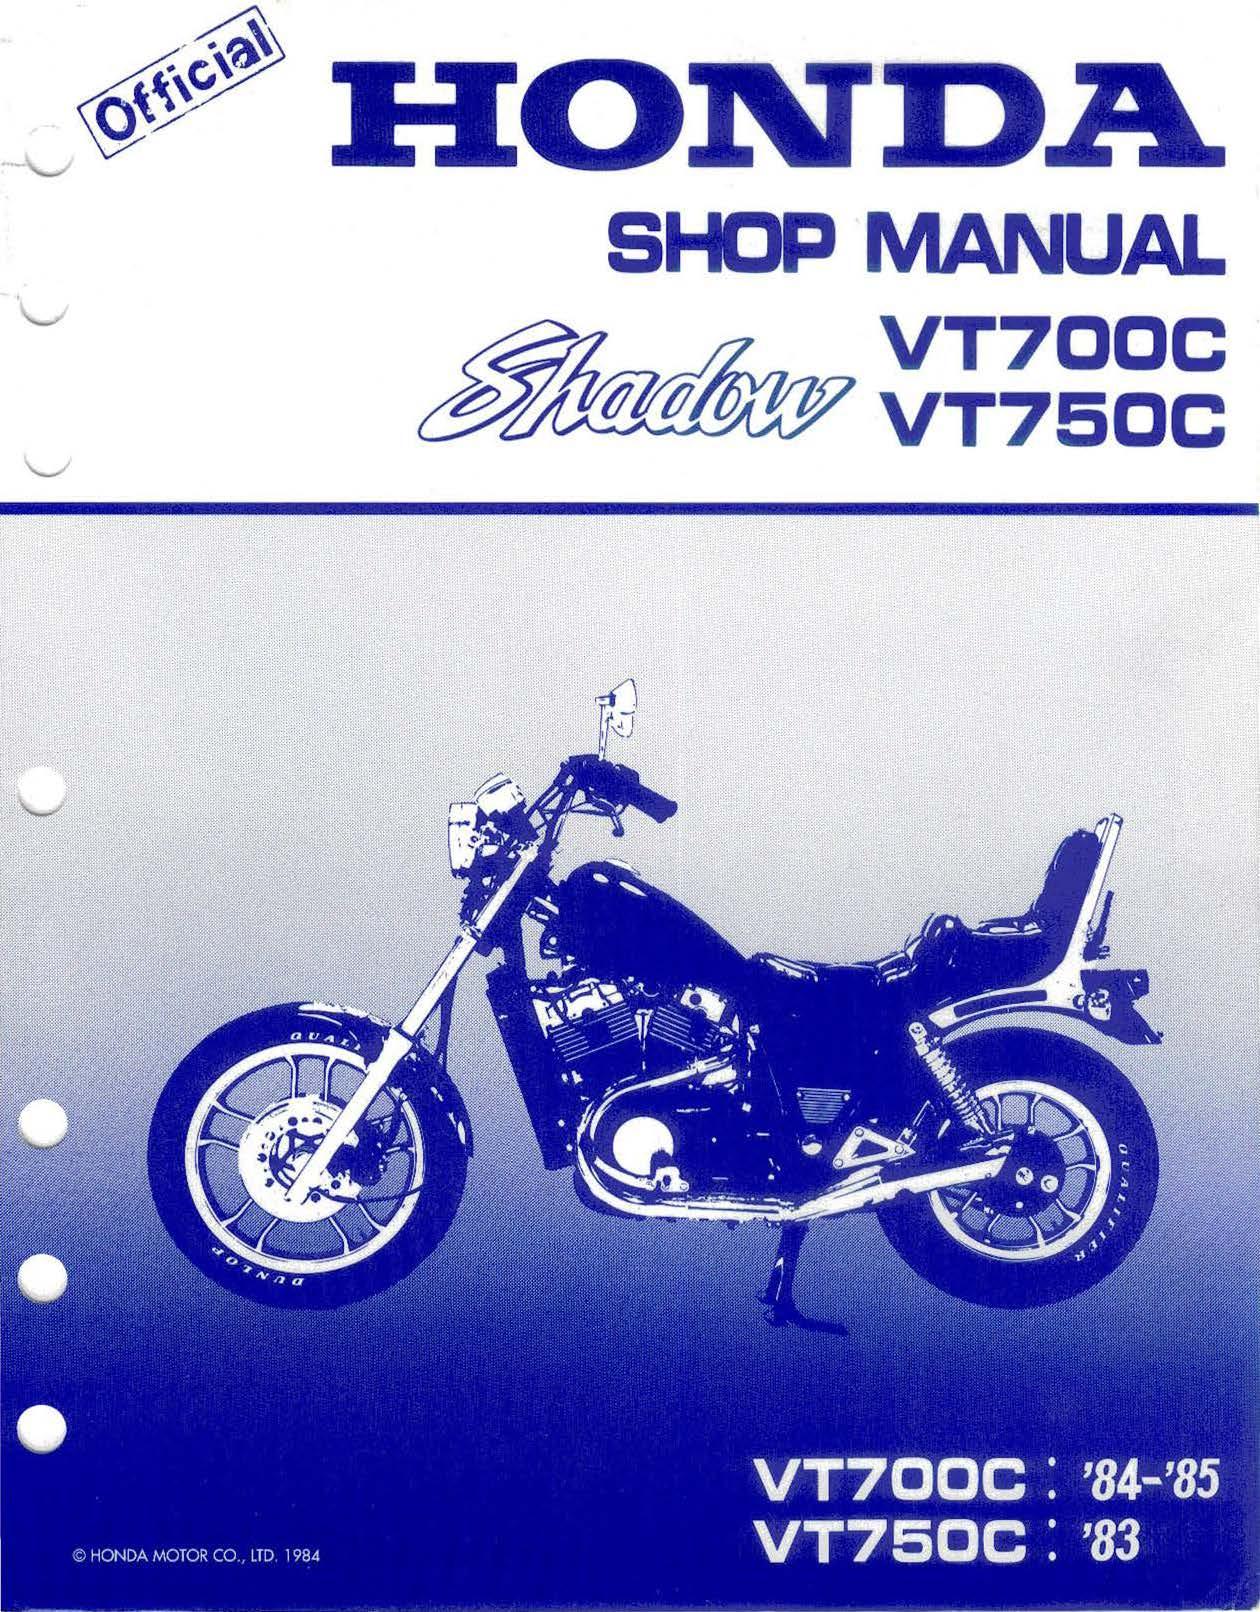 Workshop manual for Honda VT750C Shadow (1983)